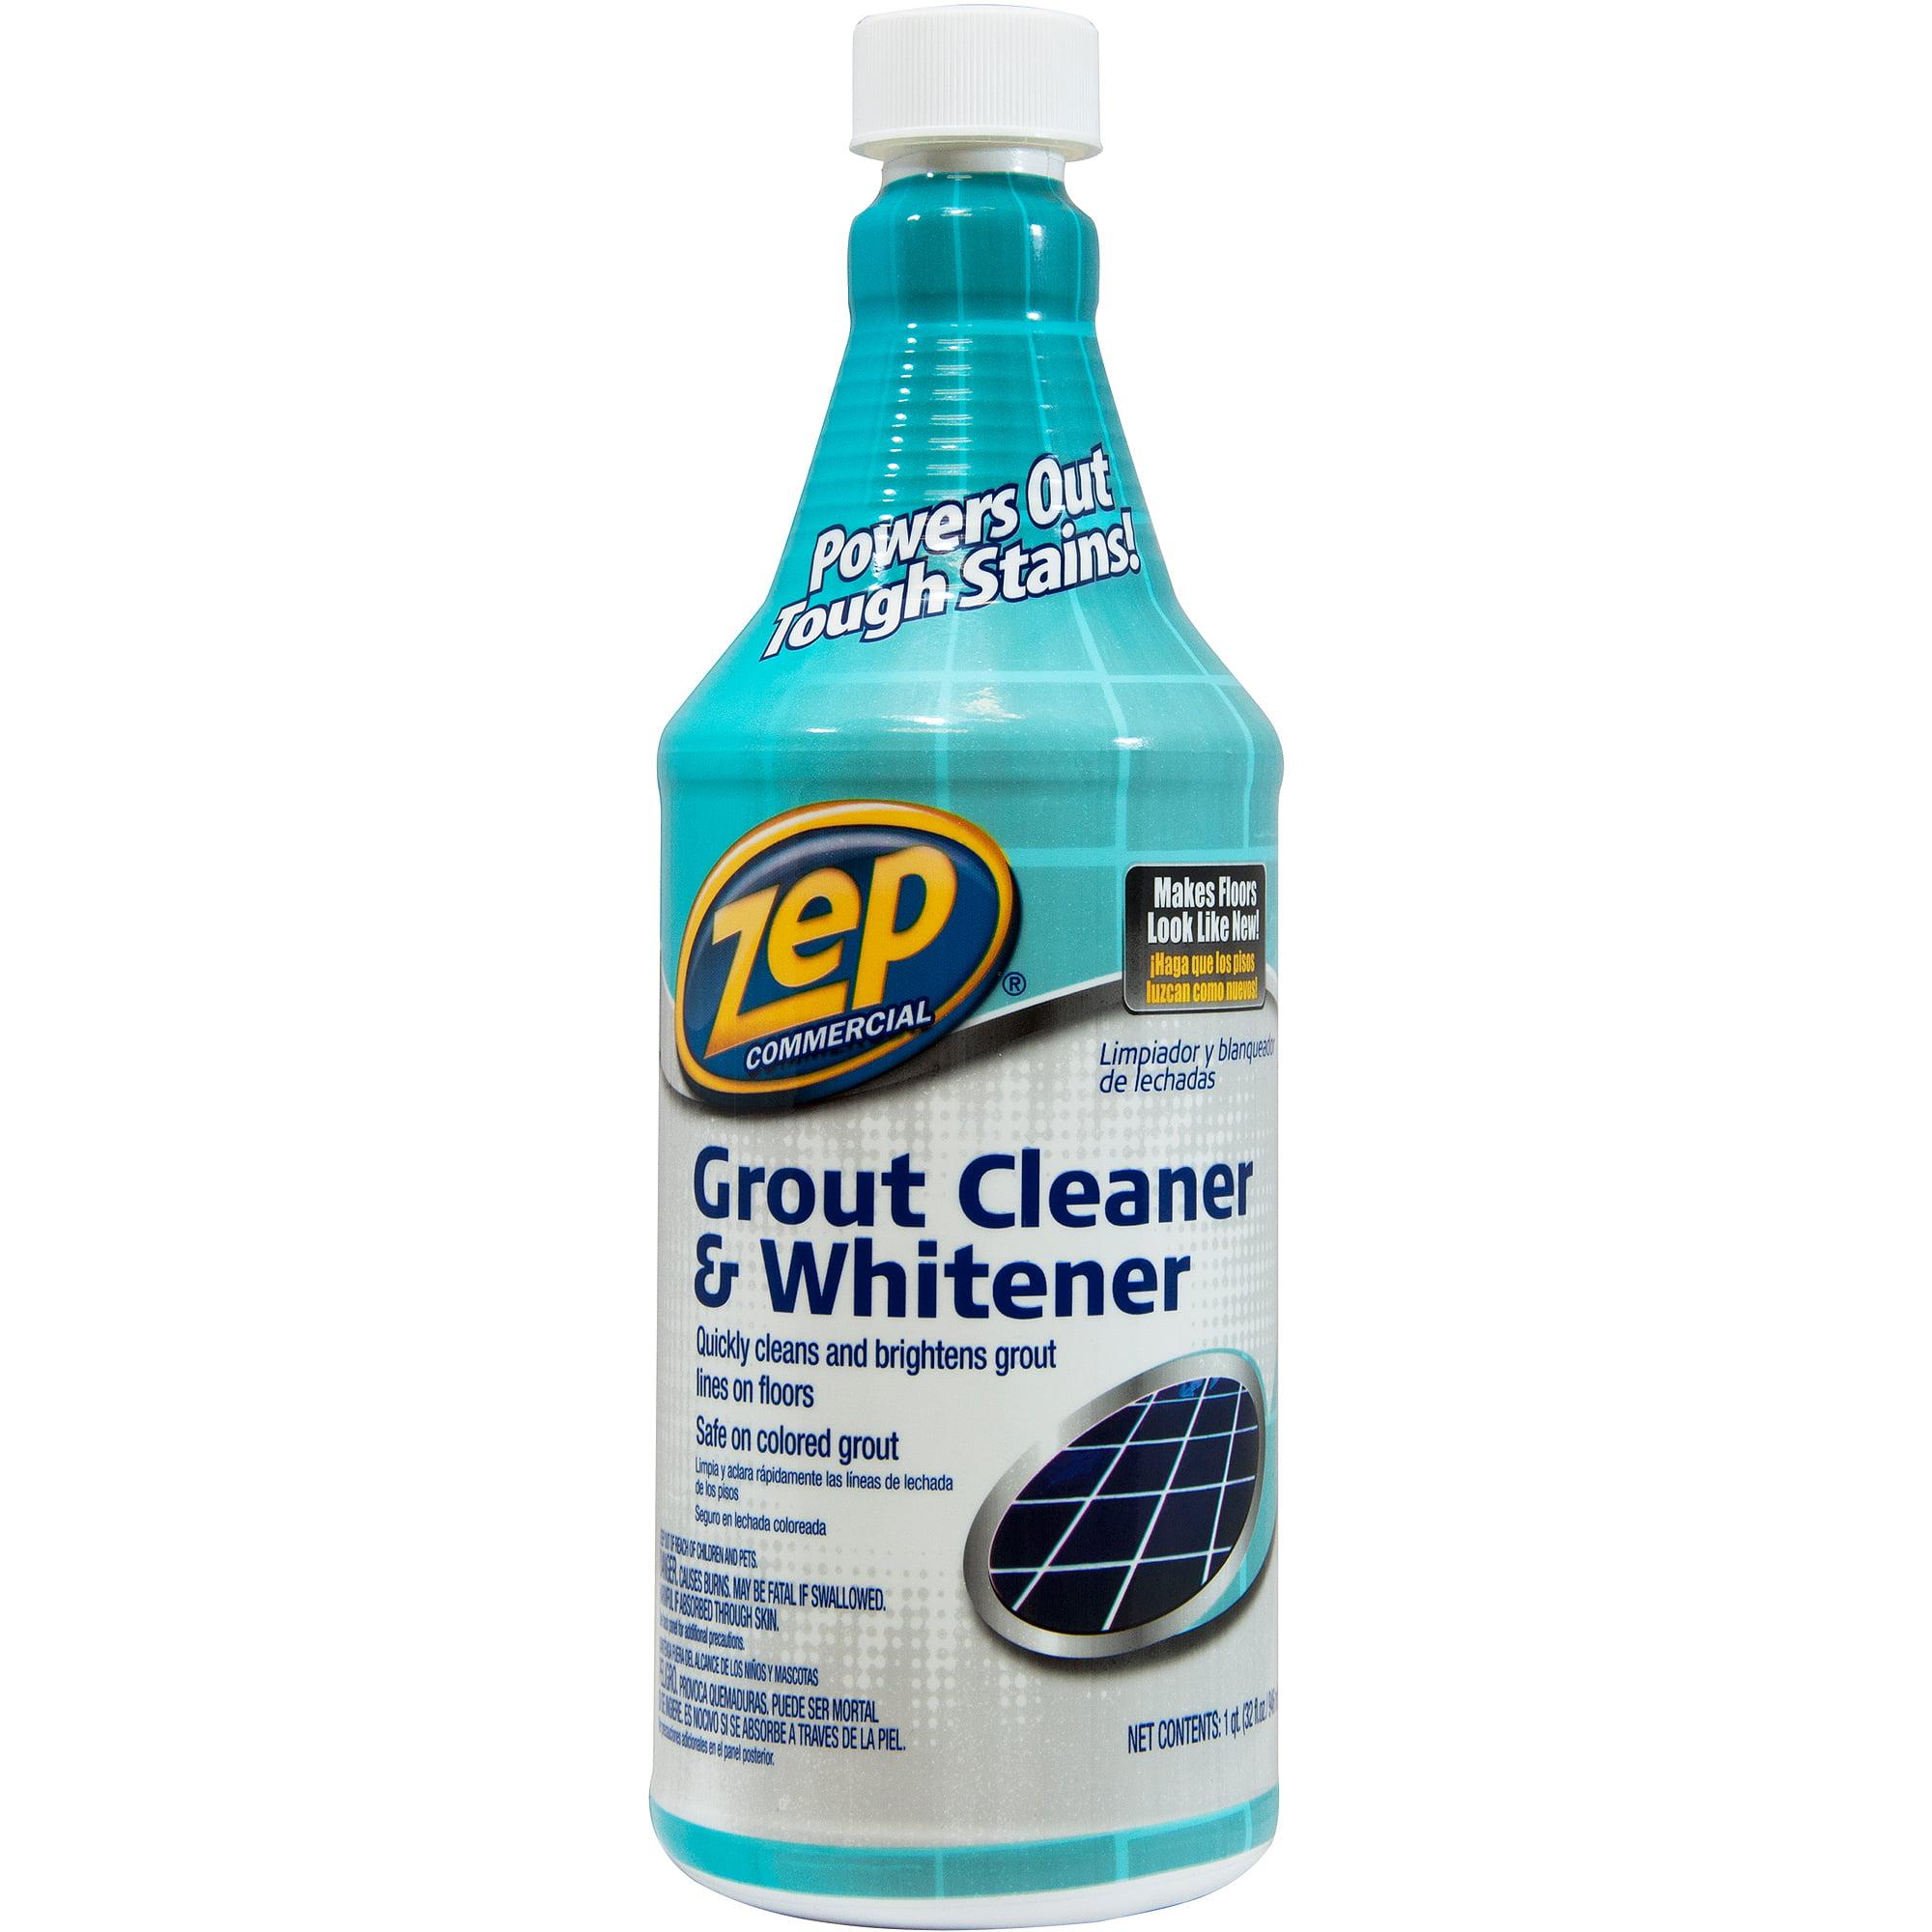 Zep Commercial Grout Cleaner, 32 oz - Walmart.com